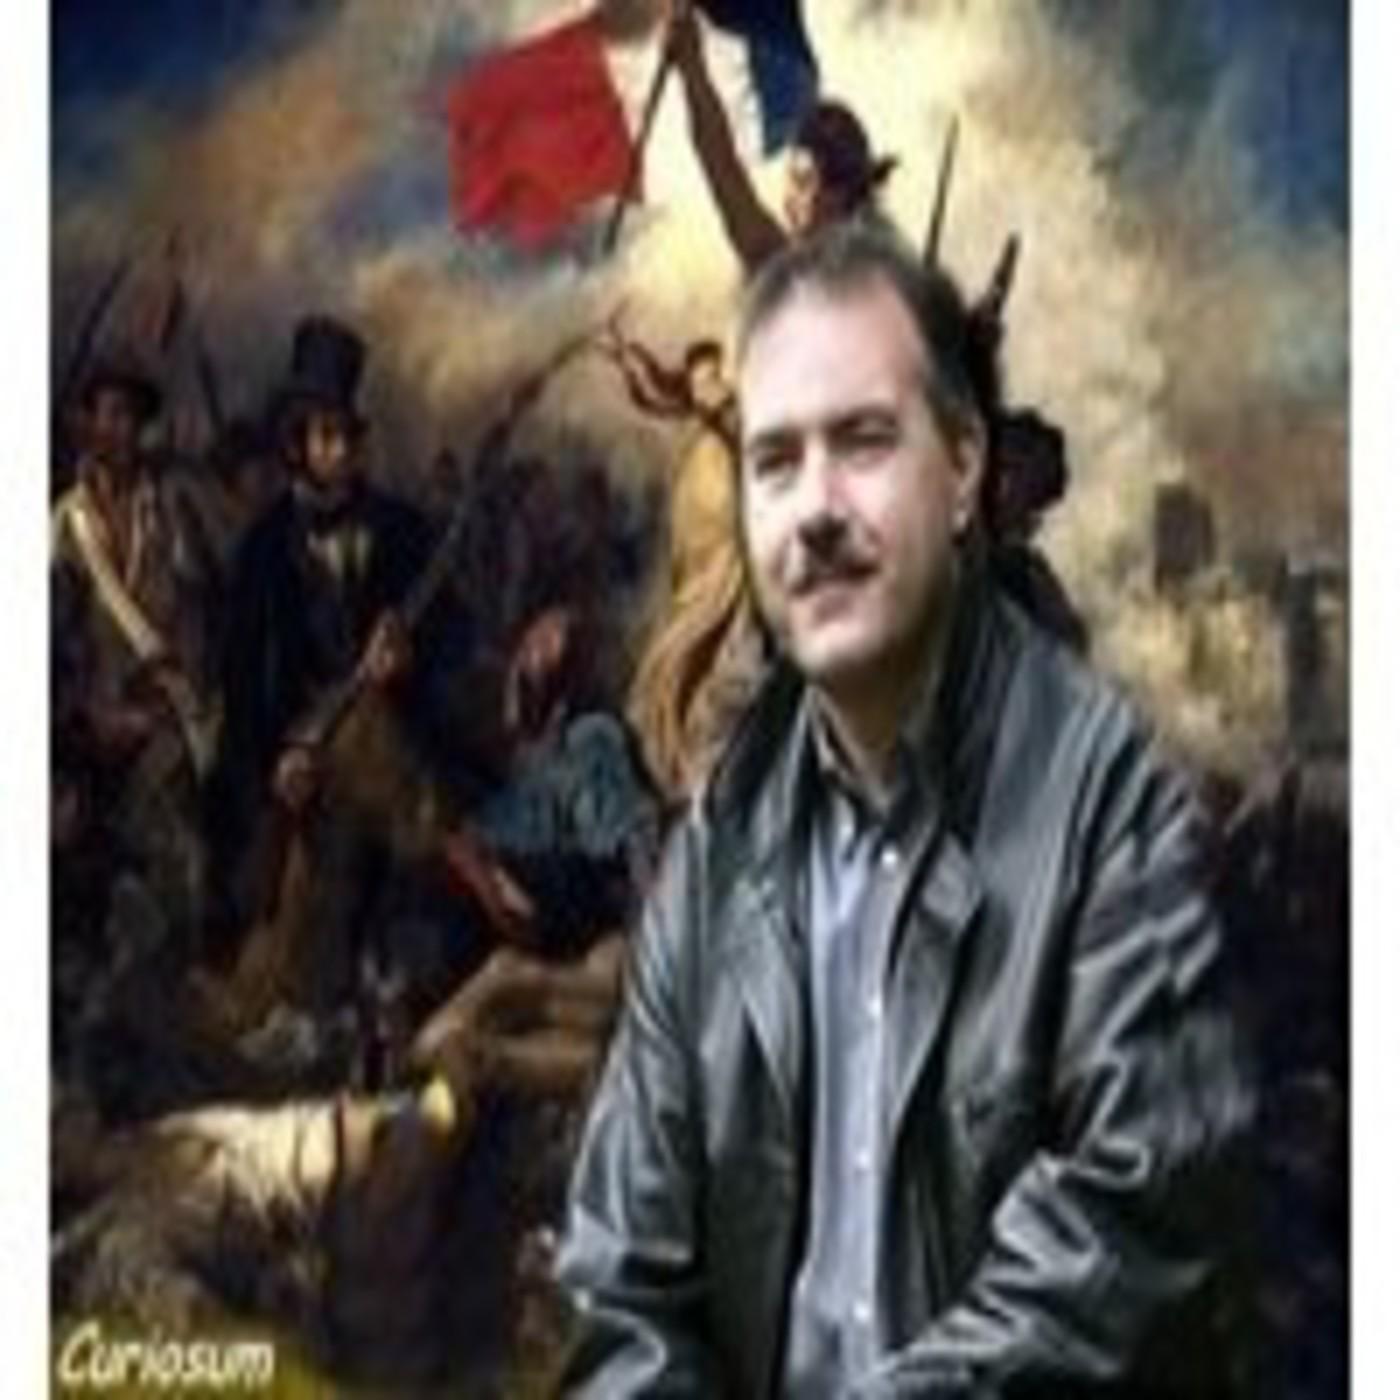 Pasajes de la historia. Horacio Nelson contra Pierre C de Villeneuve.